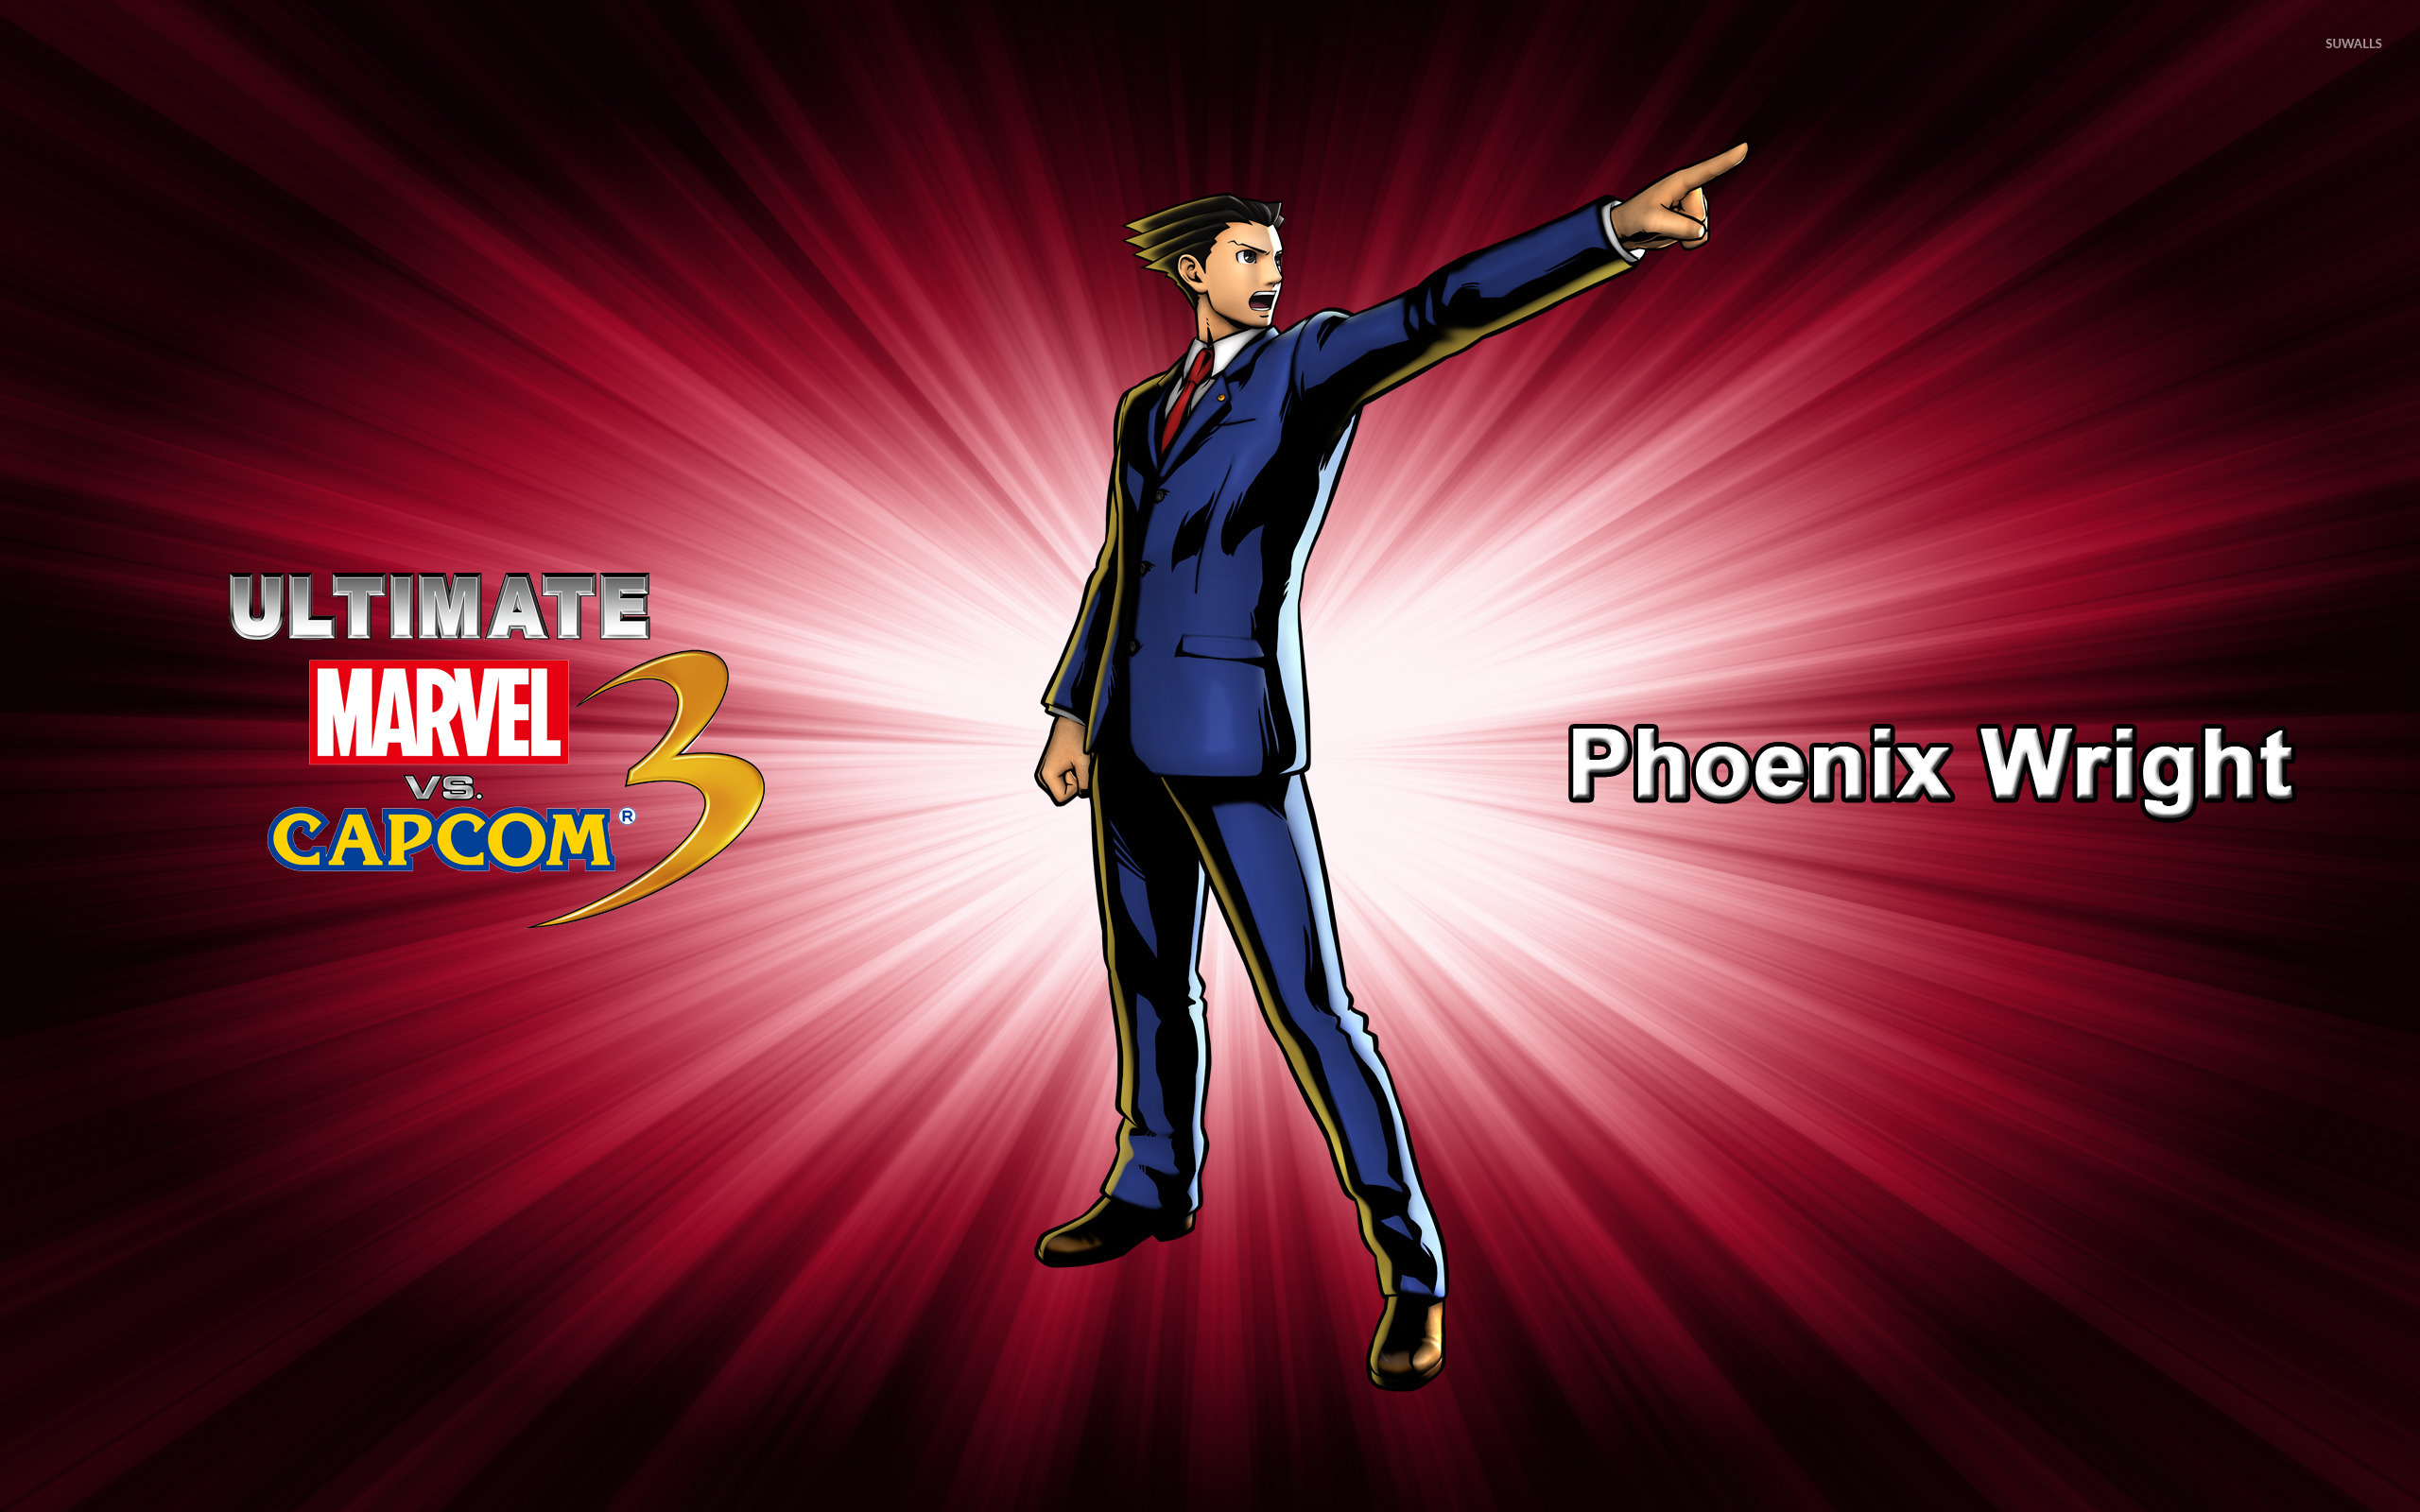 Phoenix Wright Ultimate Marvel Vs Capcom 3 Wallpaper